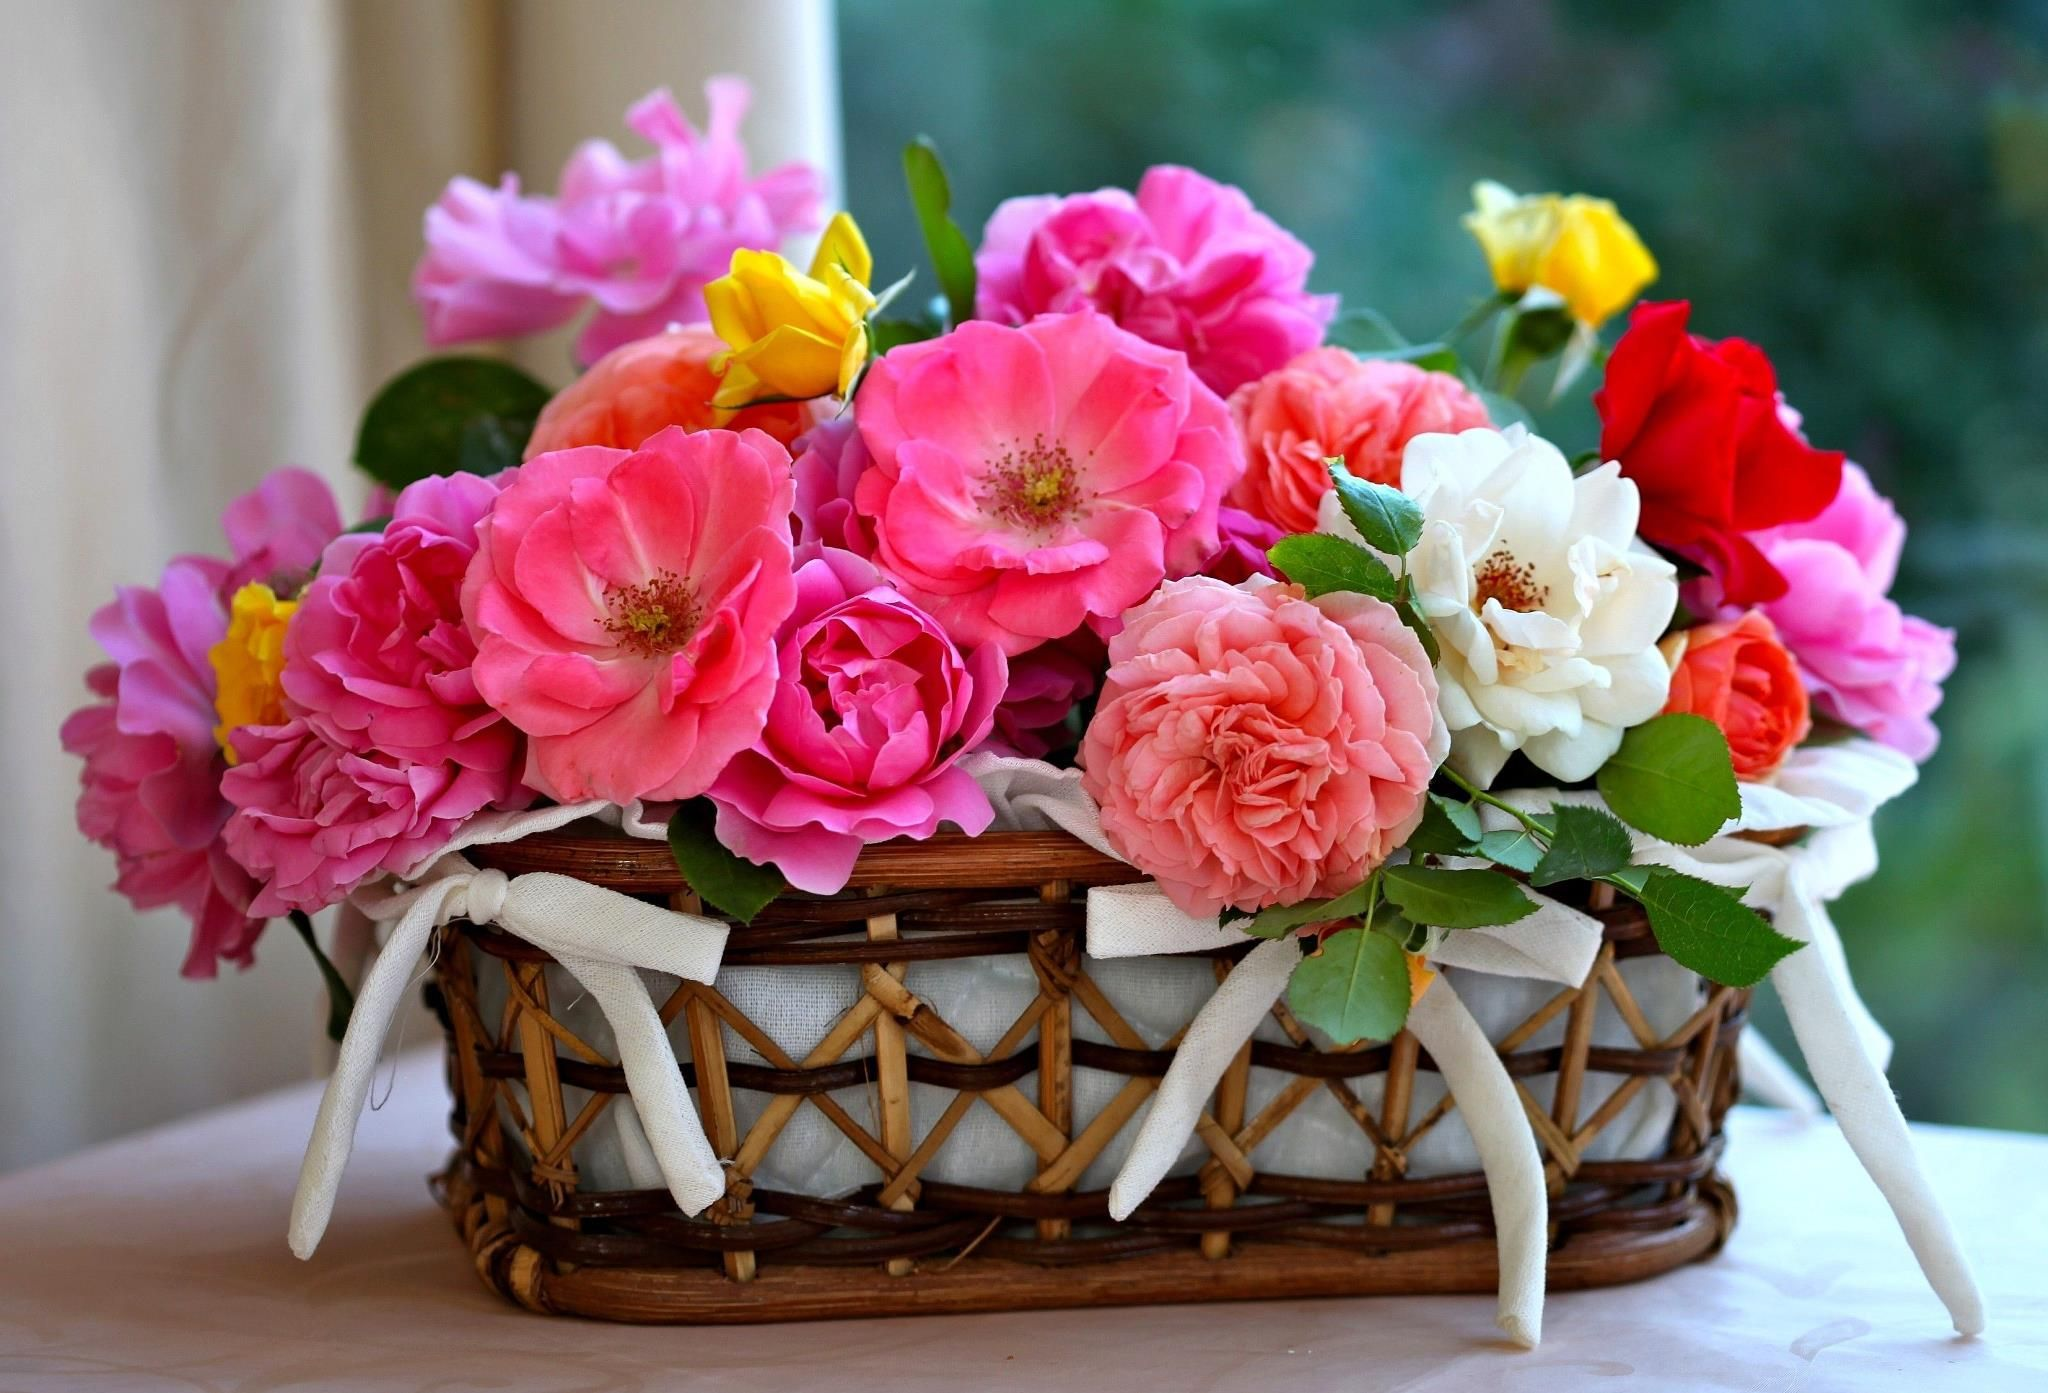 Pin by tnia sar on flower arrengements pinterest flowers a basket of flower for a sweet friend lisa mandy avaboo hd desktop wallpaper izmirmasajfo